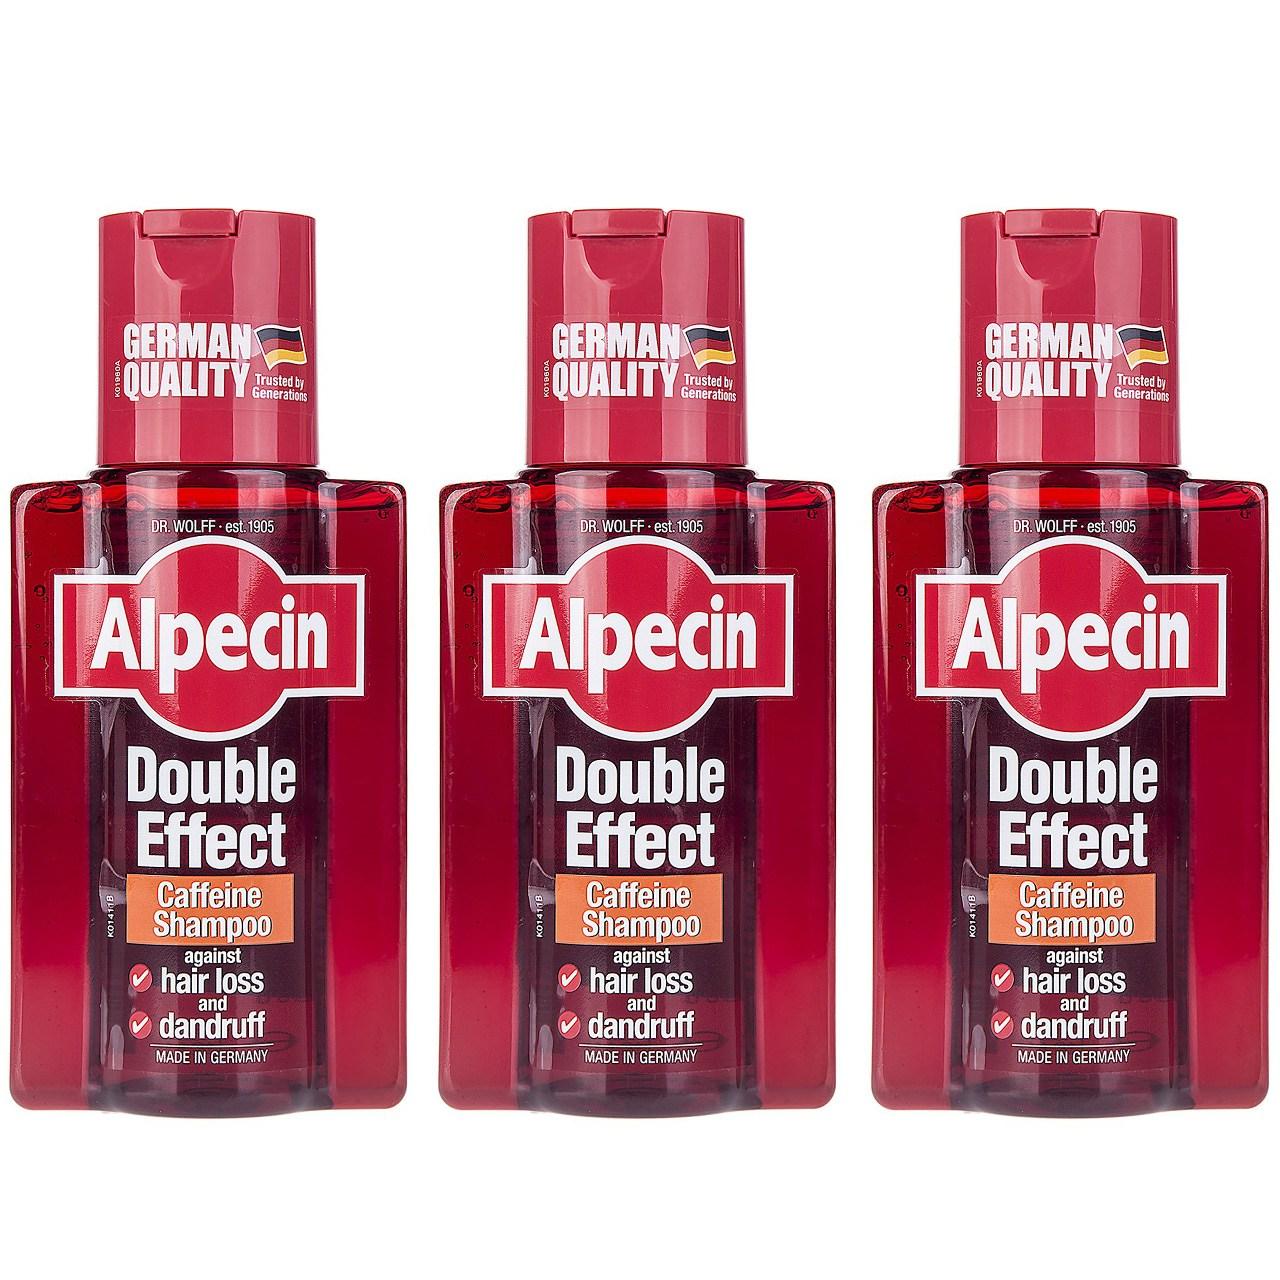 قیمت شامپو ضد شوره آلپسین مدل Double Effect Caffeine حجم 200 میلی لیتر بسته 3 عددی